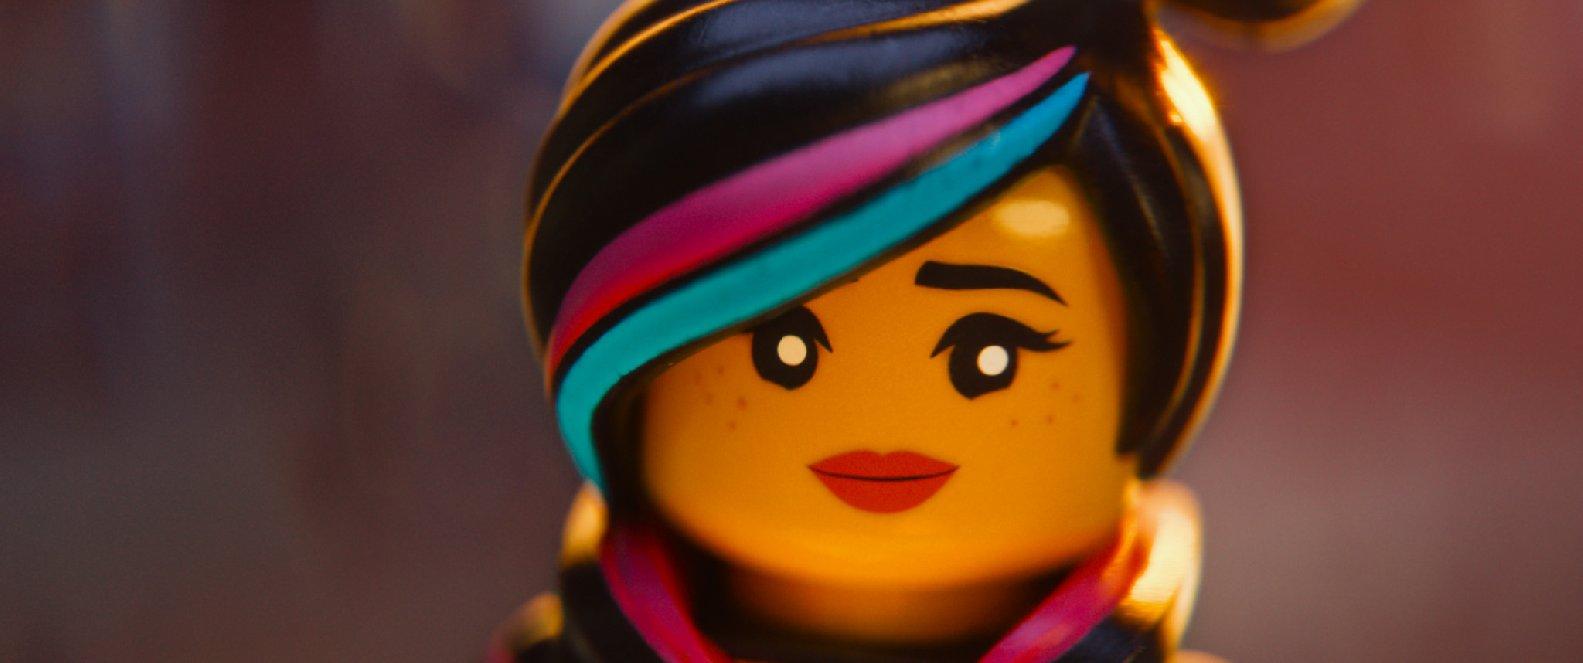 LEGO_jelenetfoto (13)